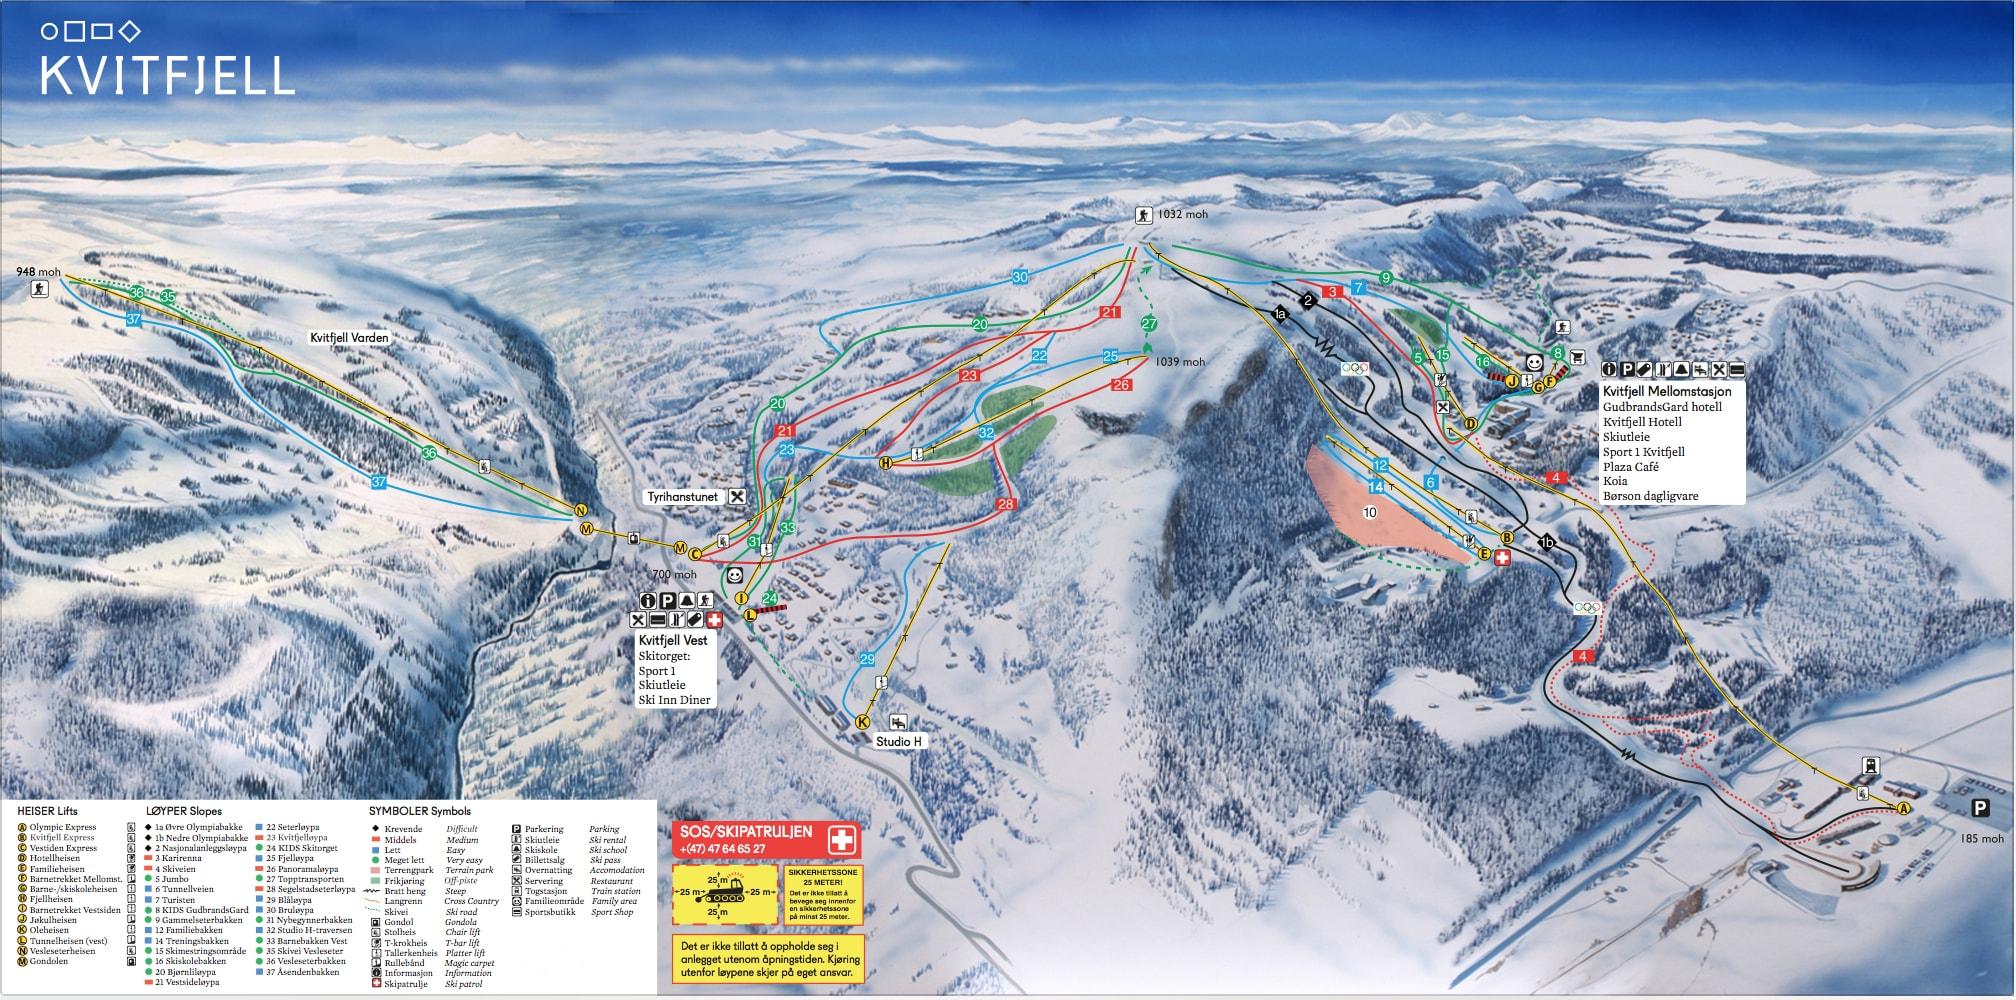 Kvitfjell Alpine Centre Piste / Trail Map